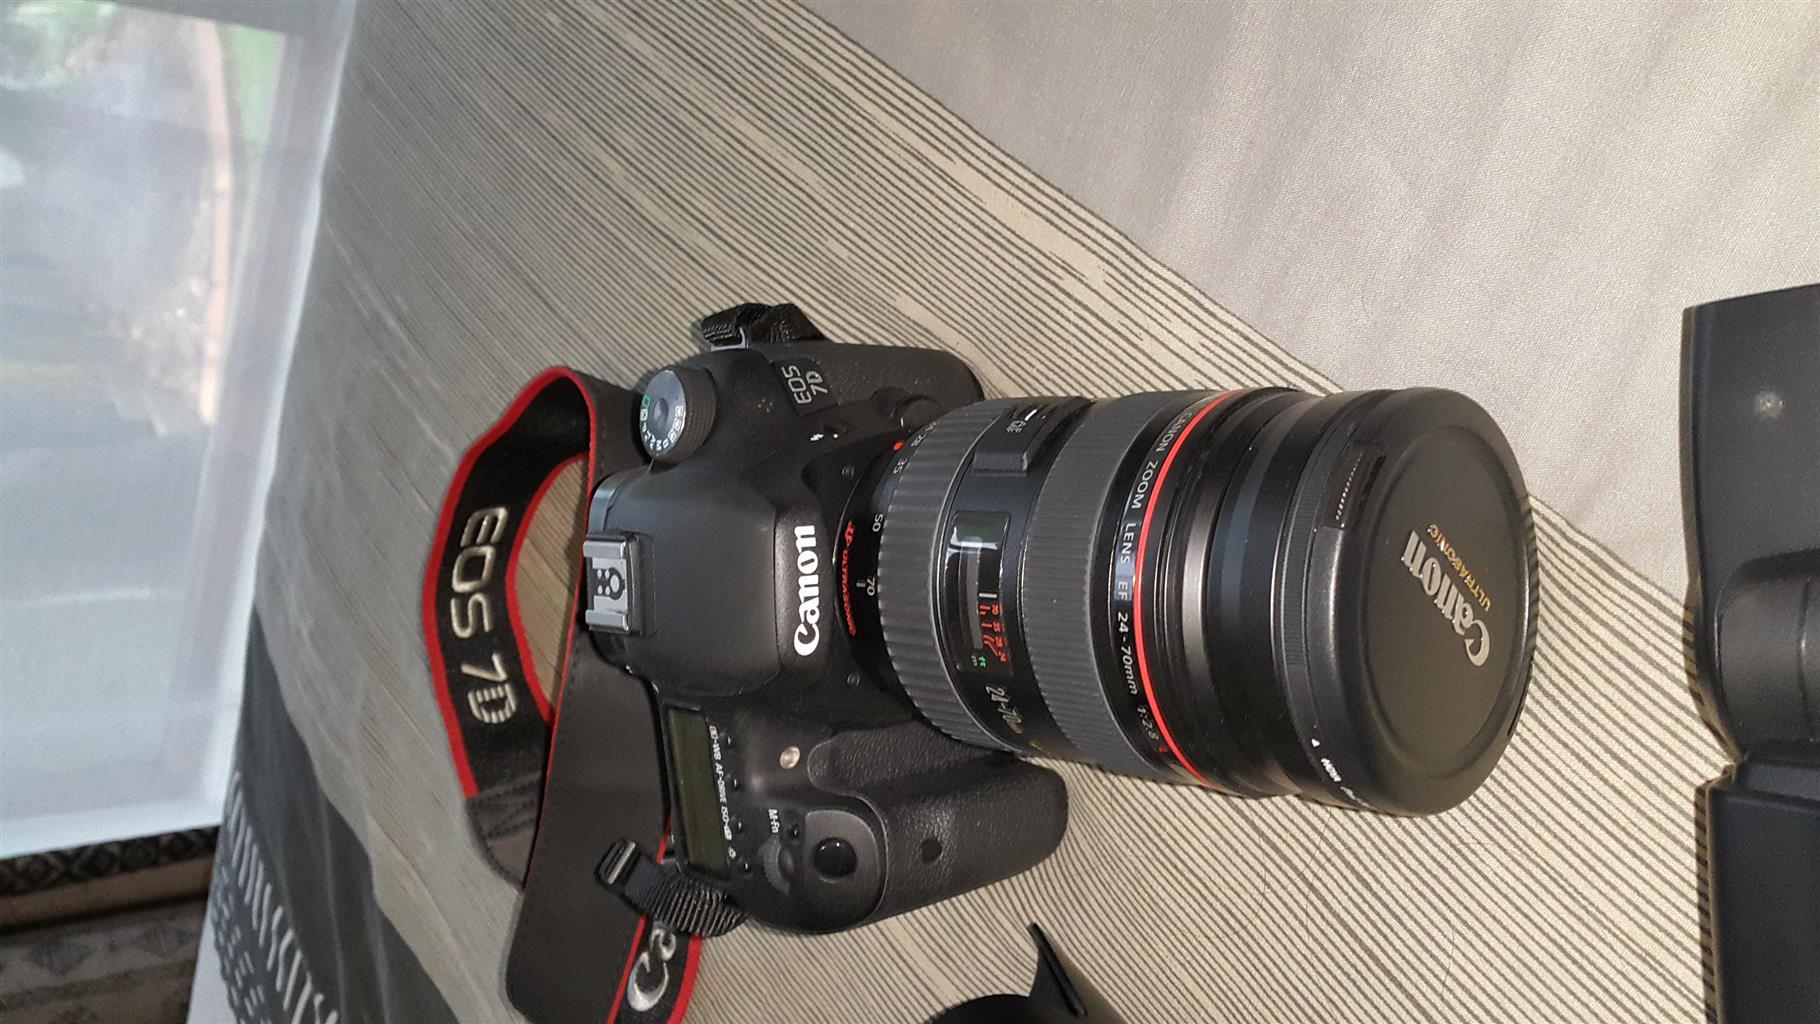 Canon 7D DSLR Bundle + 70-200 L Series + 24-70 L Series + 2 times converter + backpack + Speedlight 480 EX